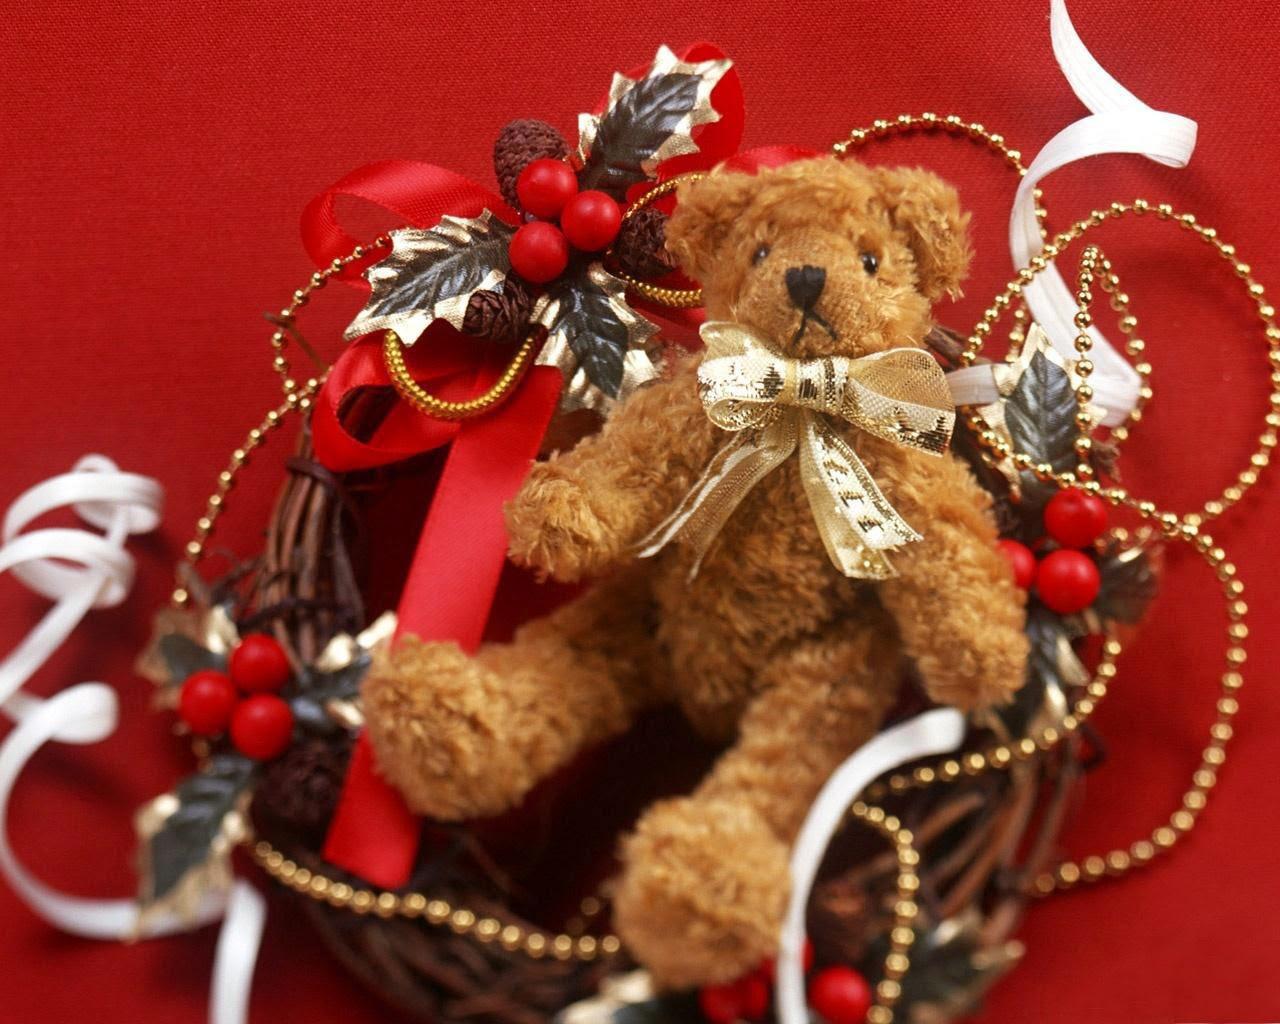 Sweet cute teddy bear wallpapers - photo#24